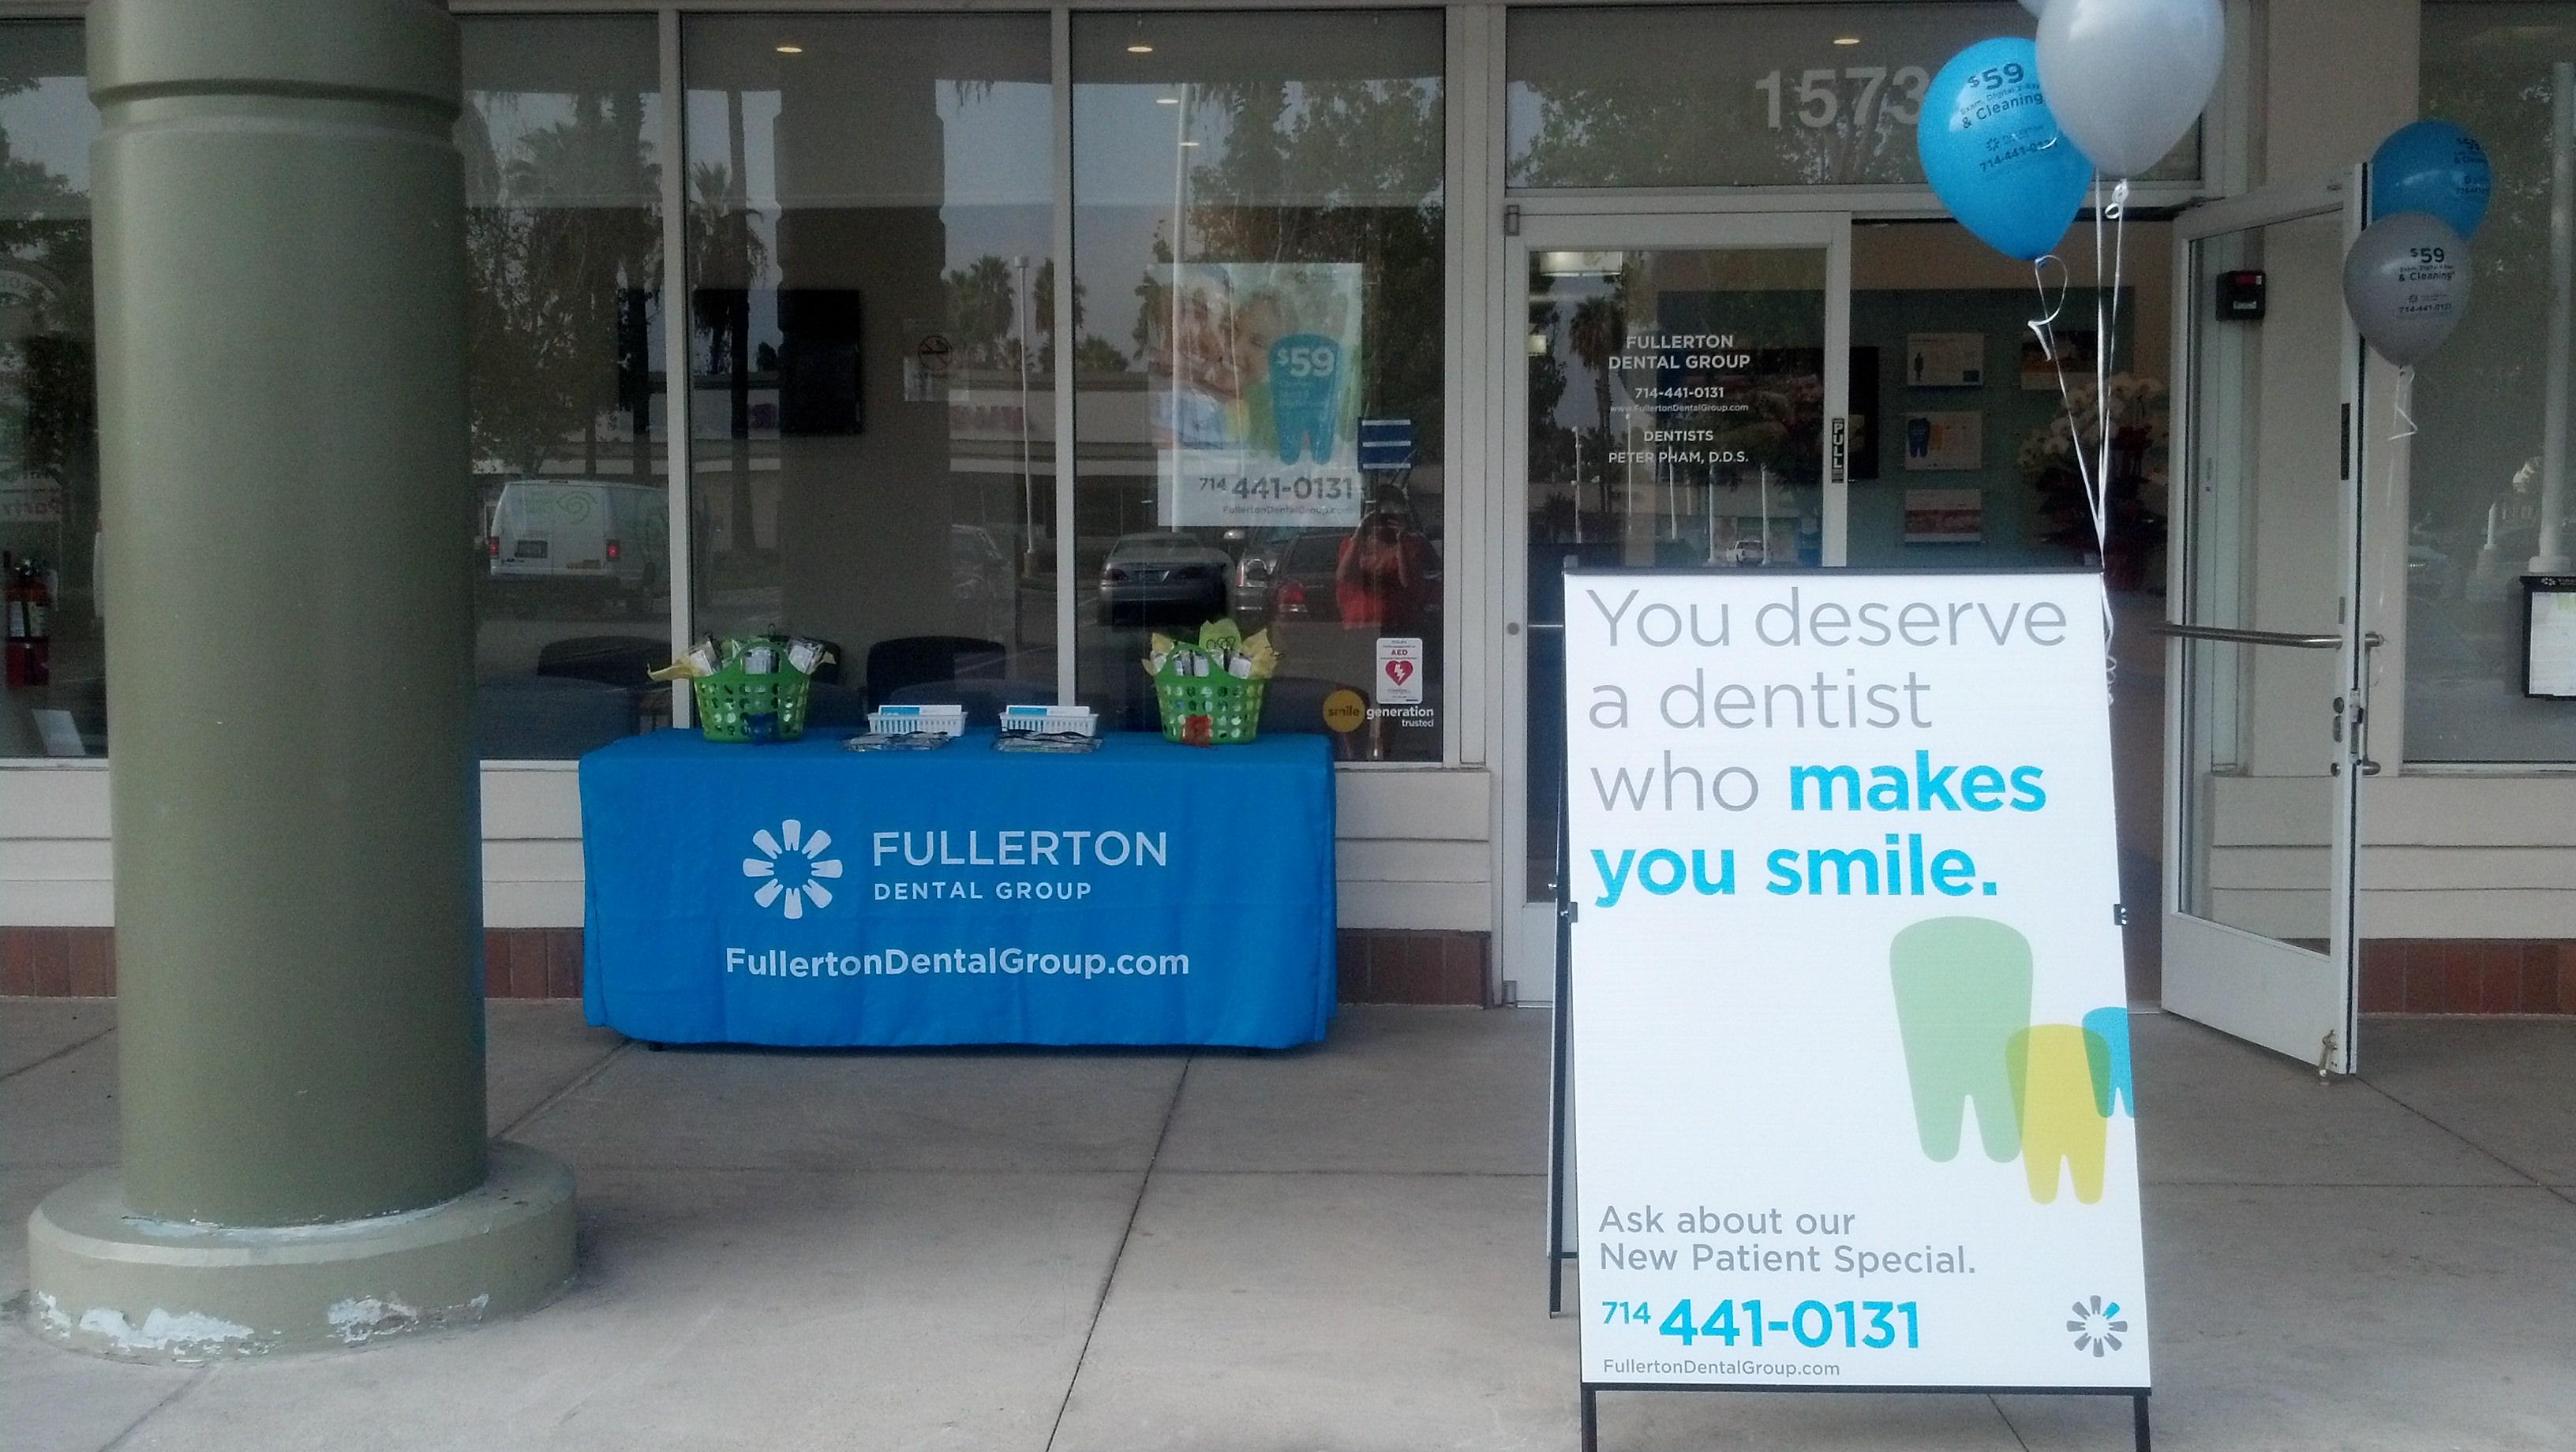 Fullerton Dental Group image 13